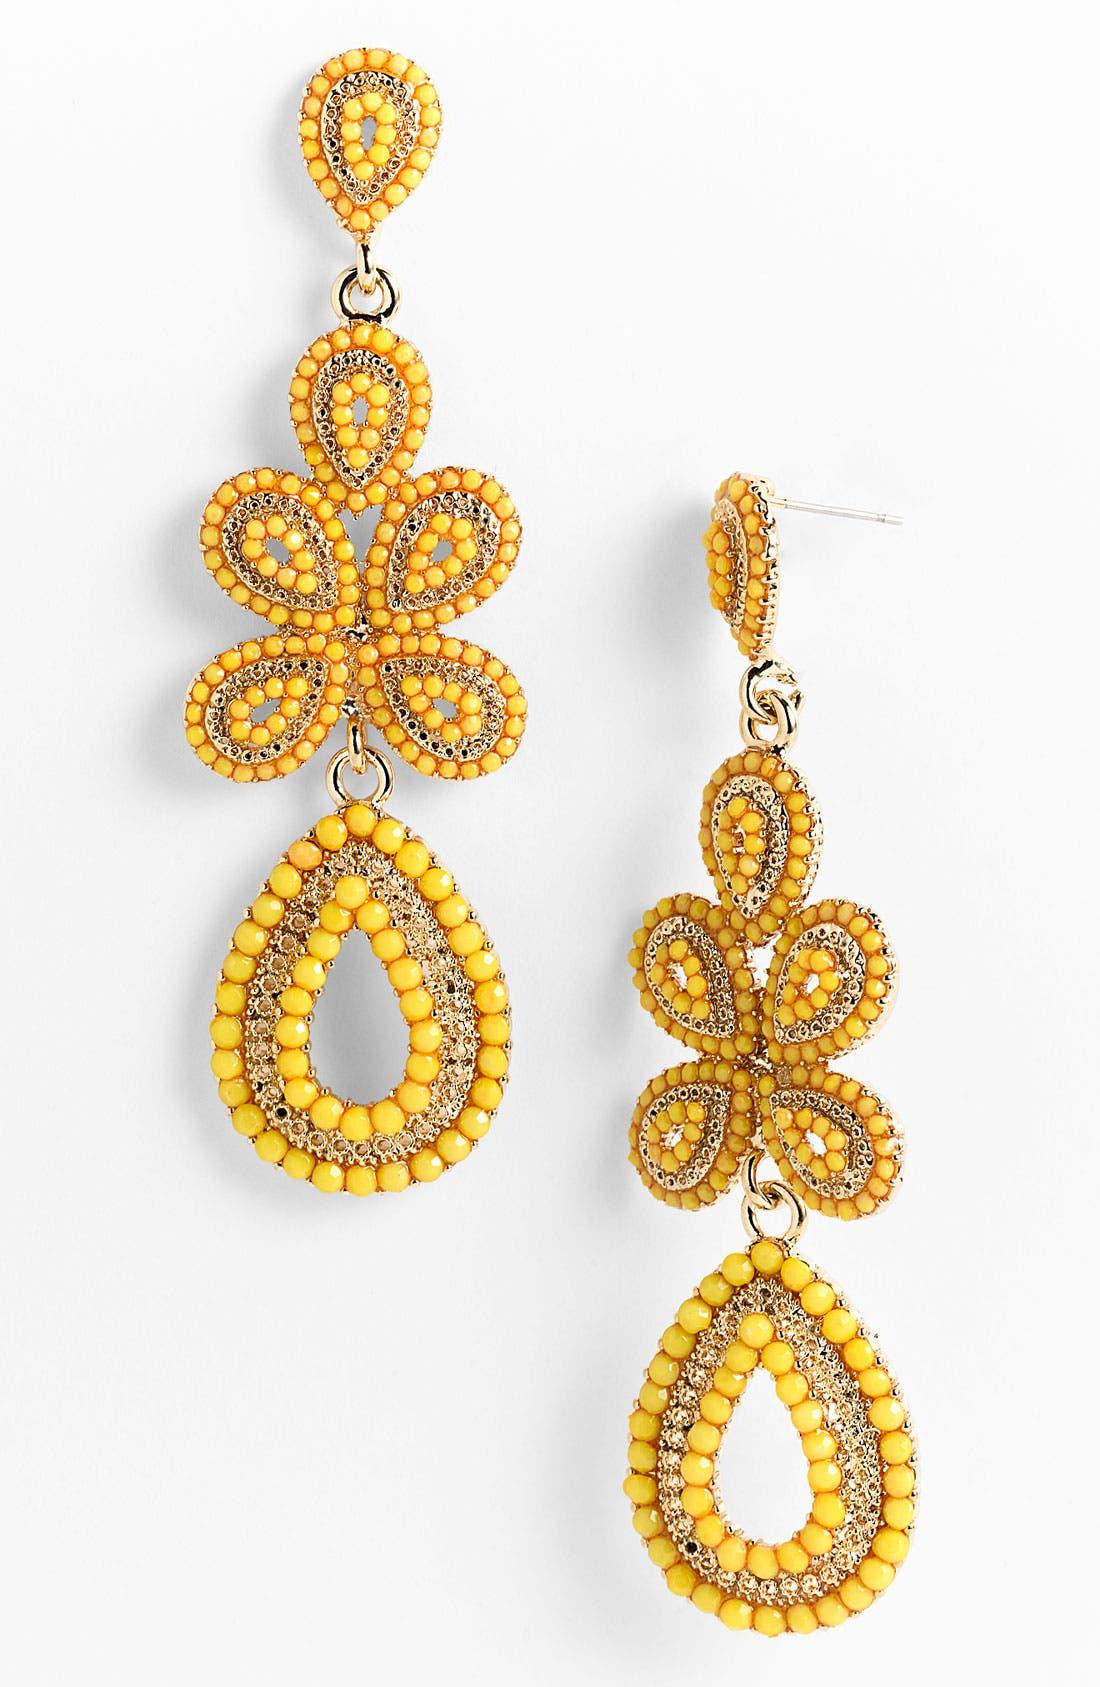 'Ornate' Linear Statement Earrings,                             Main thumbnail 15, color,